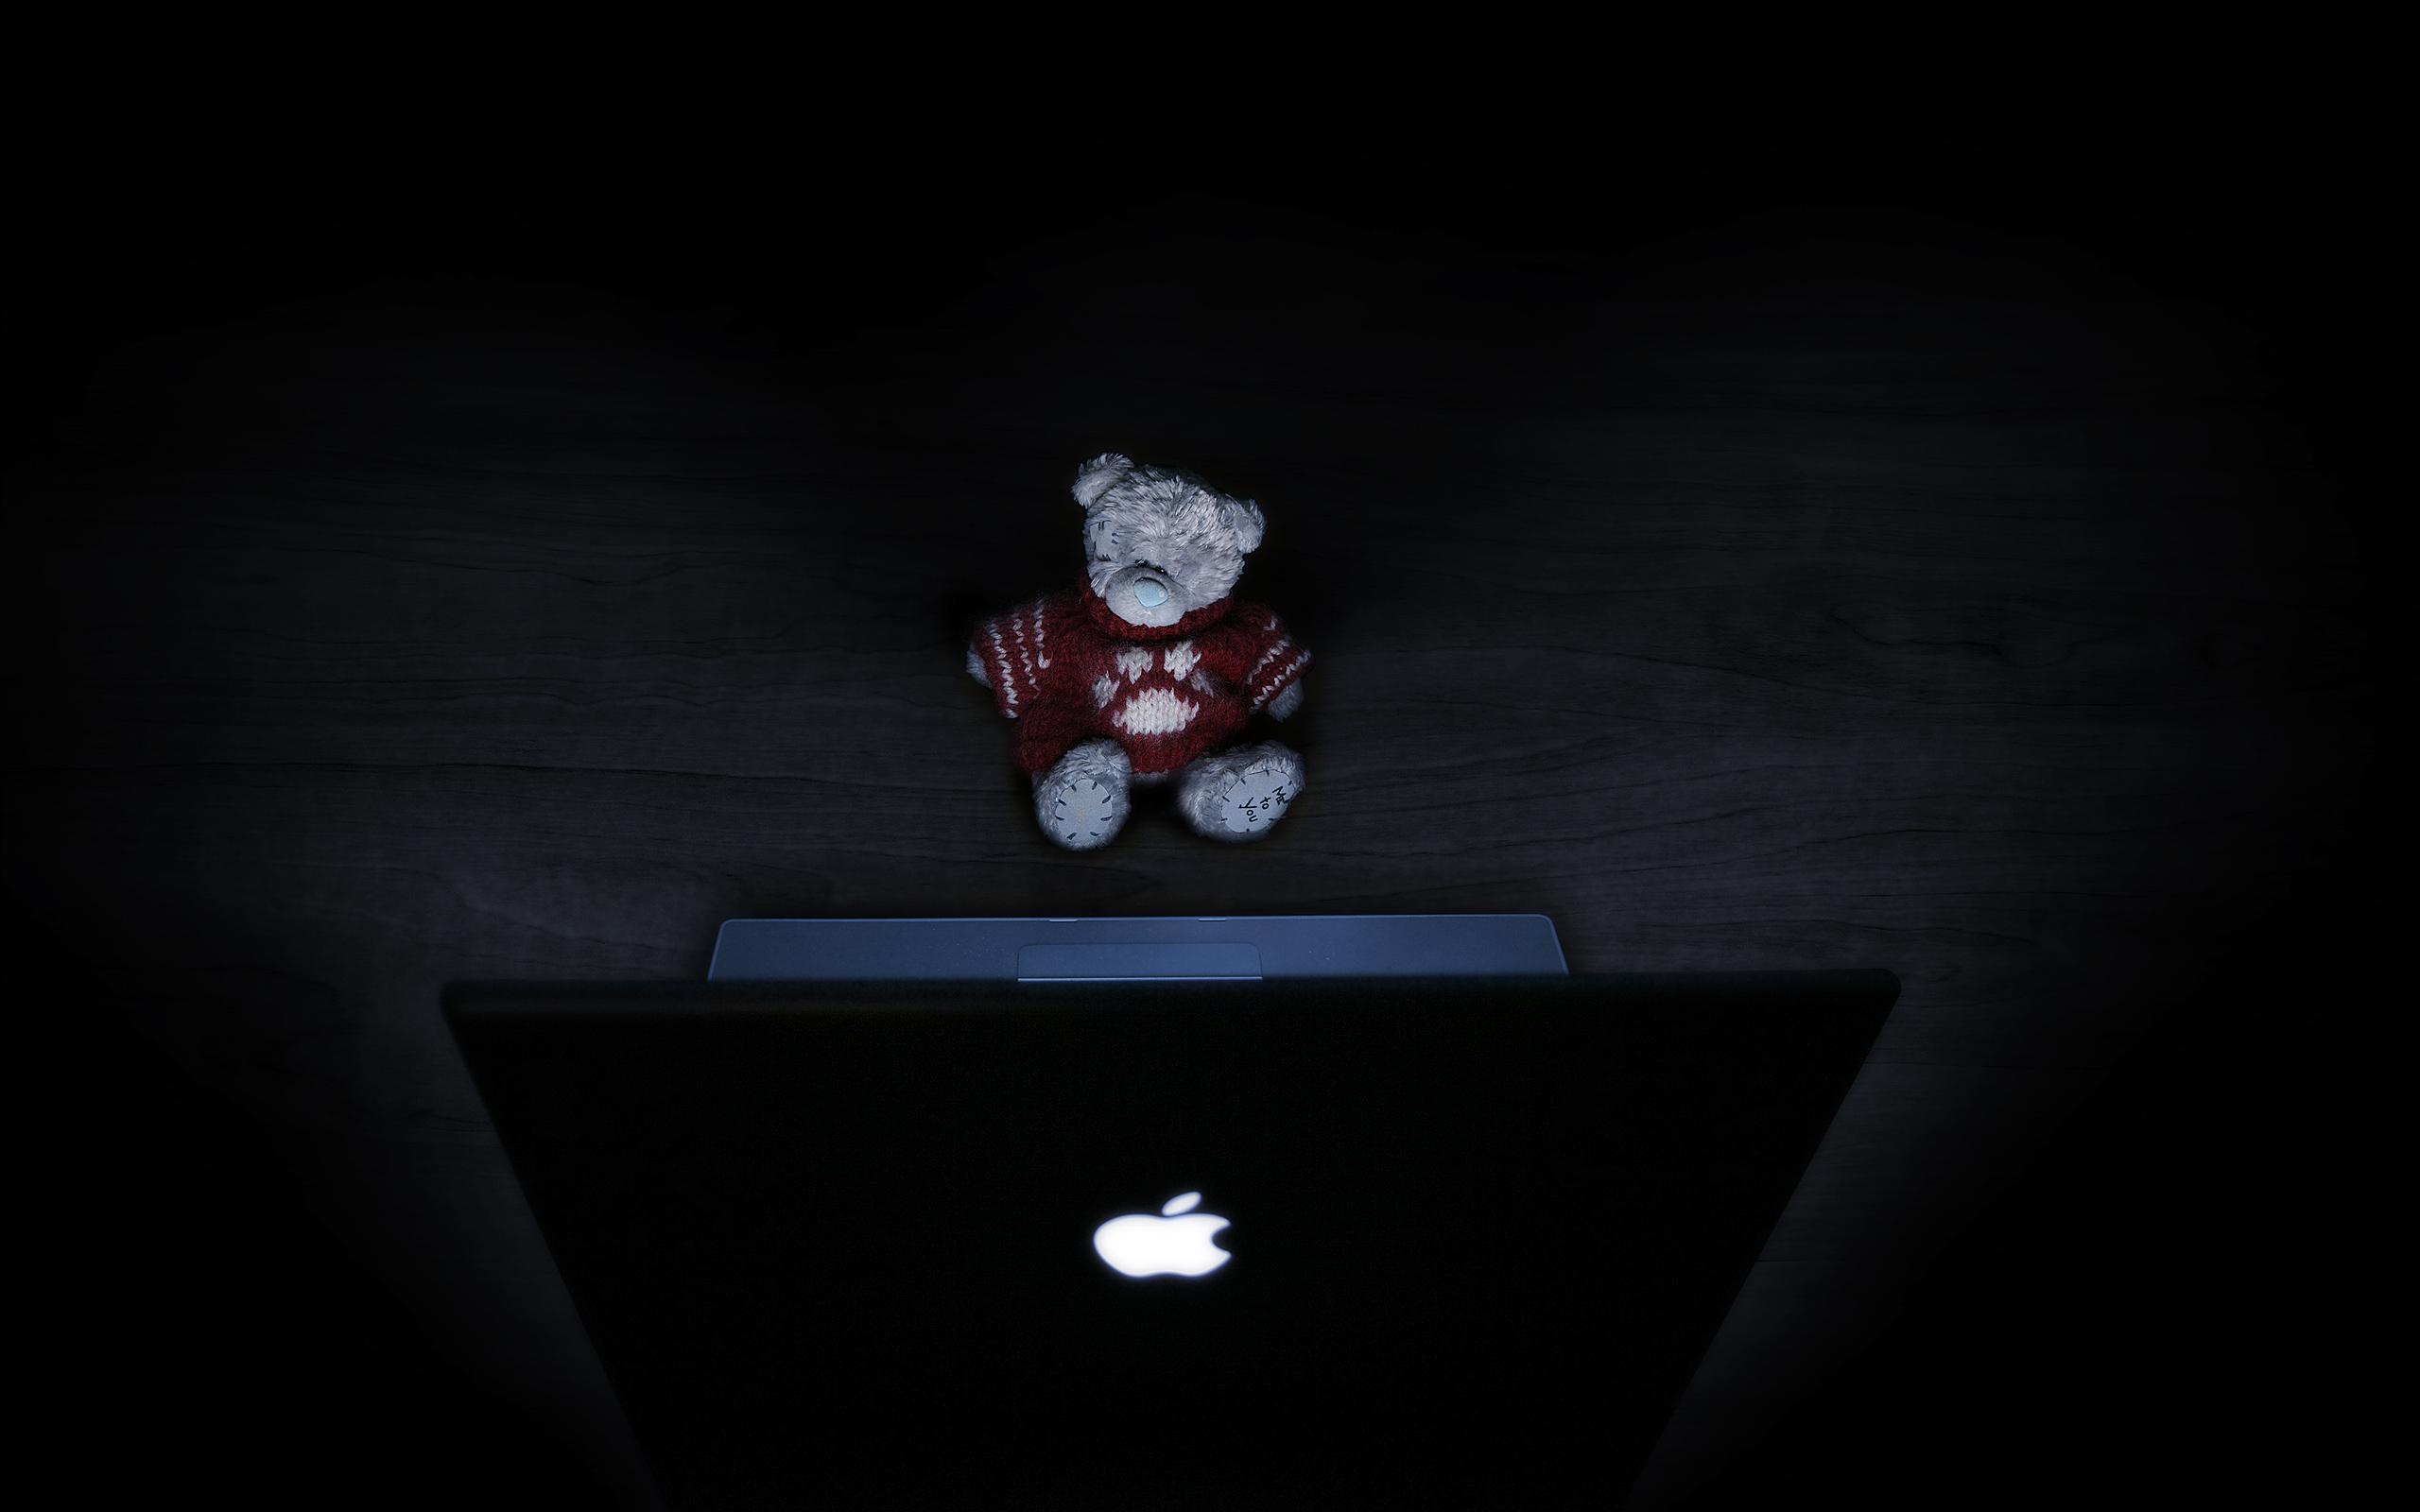 Teddybear Mac Wallpapers HD Wallpapers 2560x1600